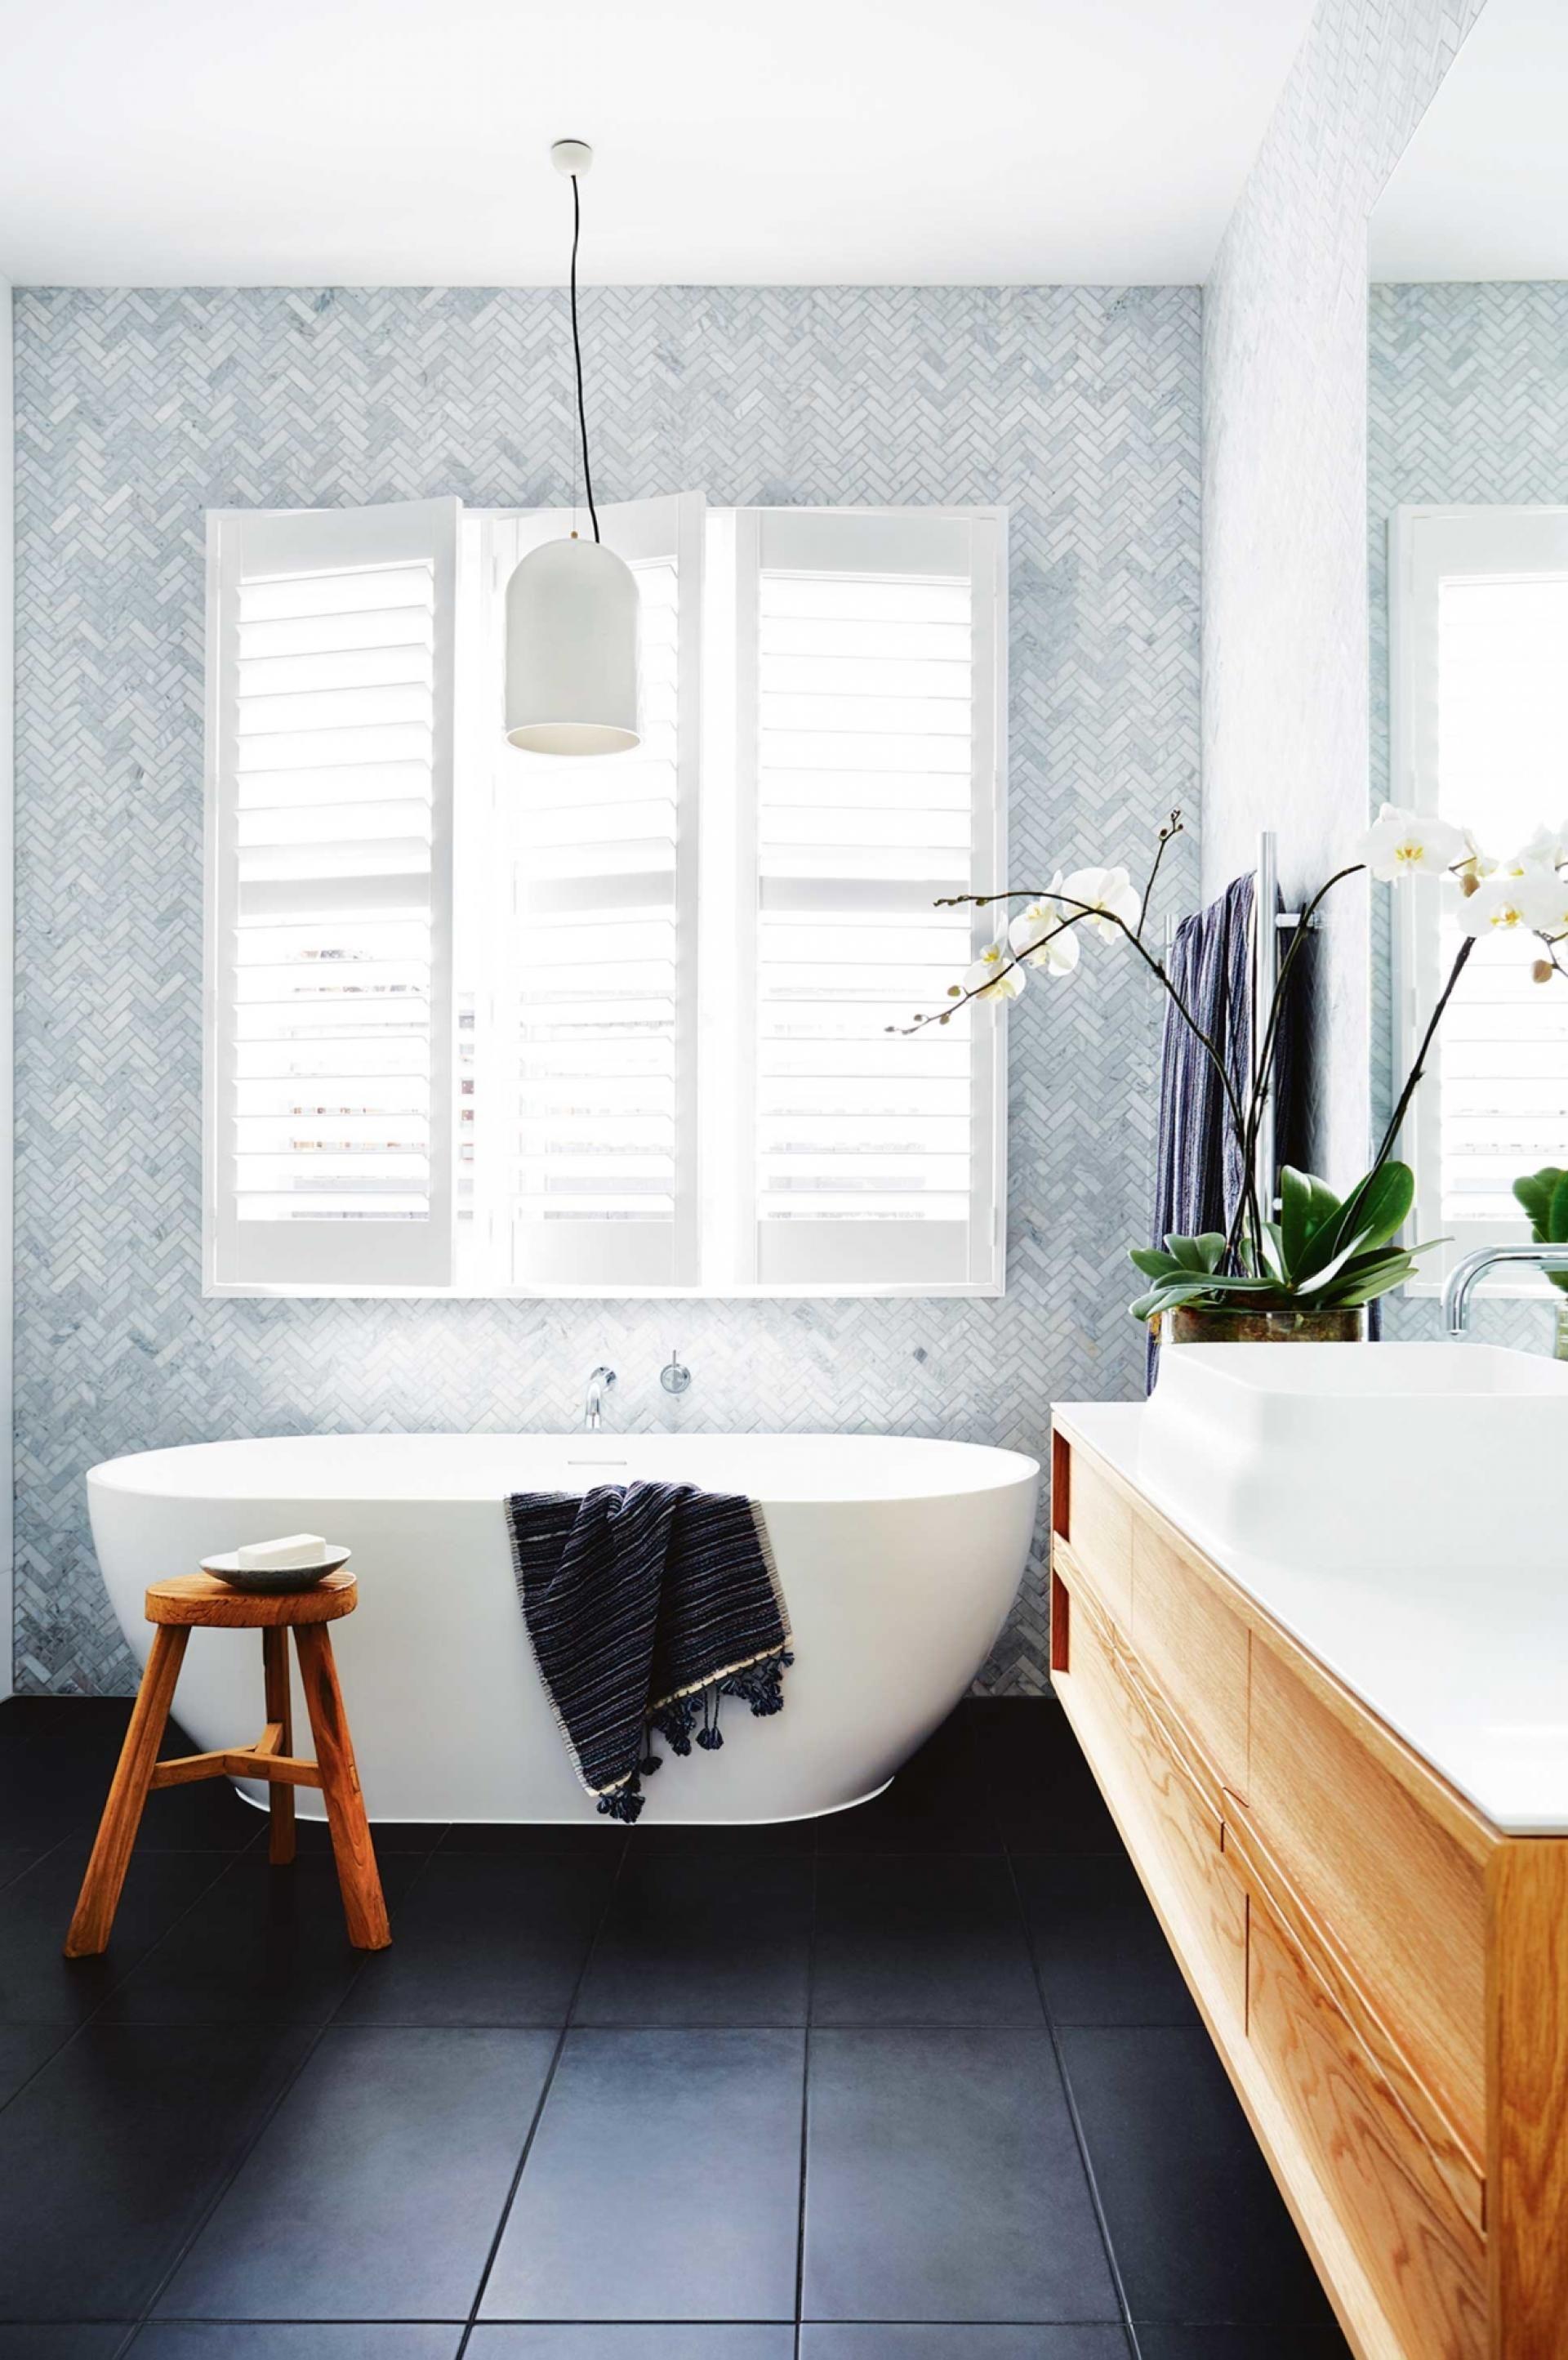 brightbathroom OFI DEC16 Spaces and places Pinterest Timber